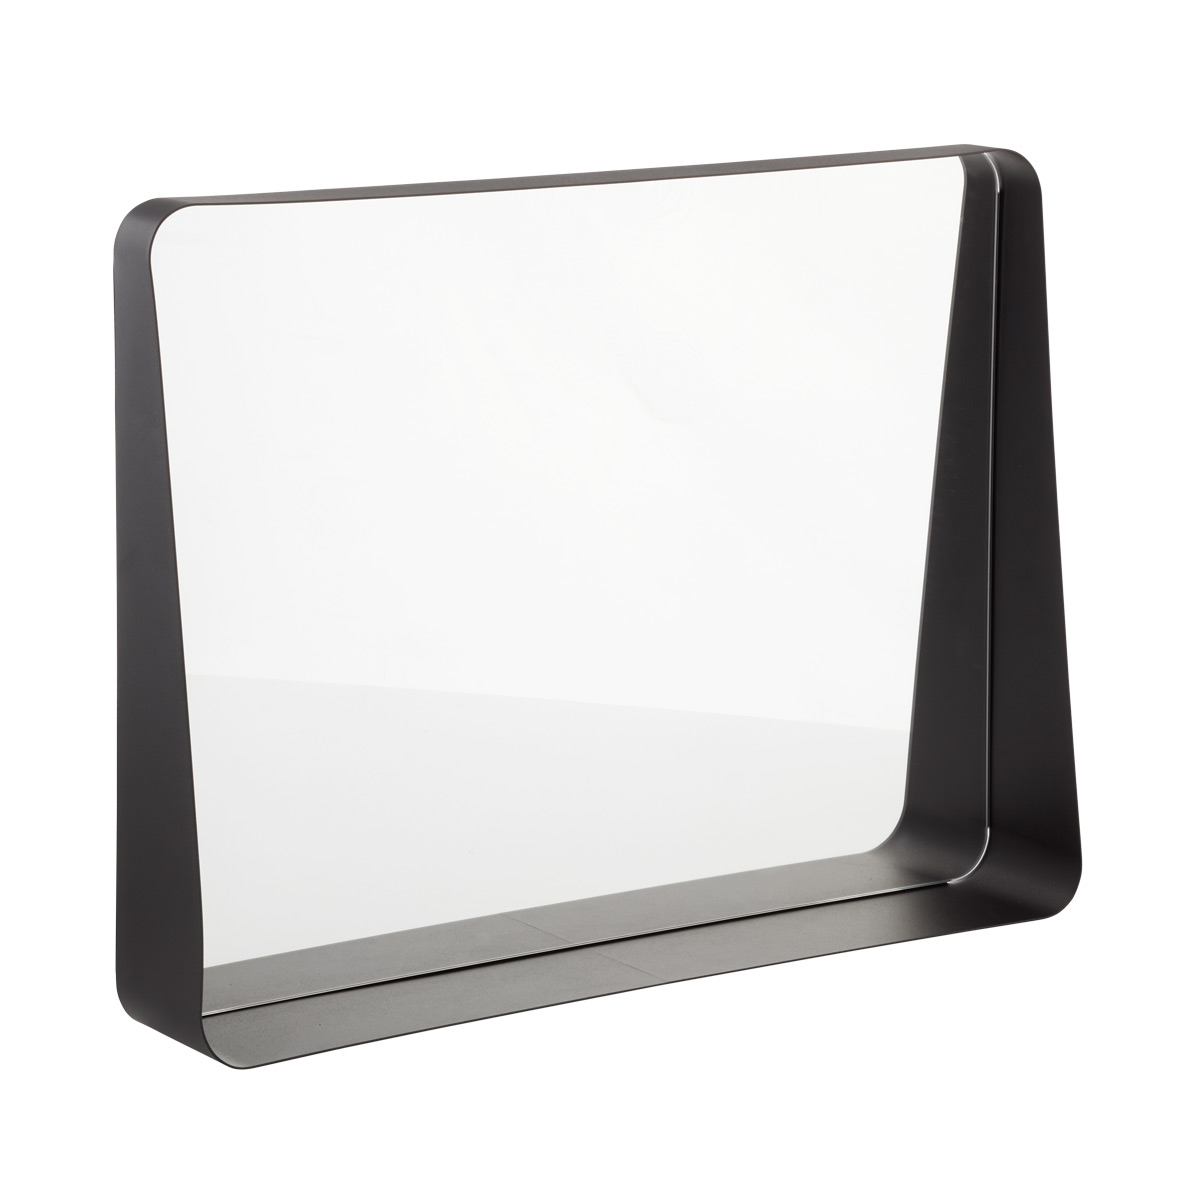 Horizontal Arch Wall Mirror